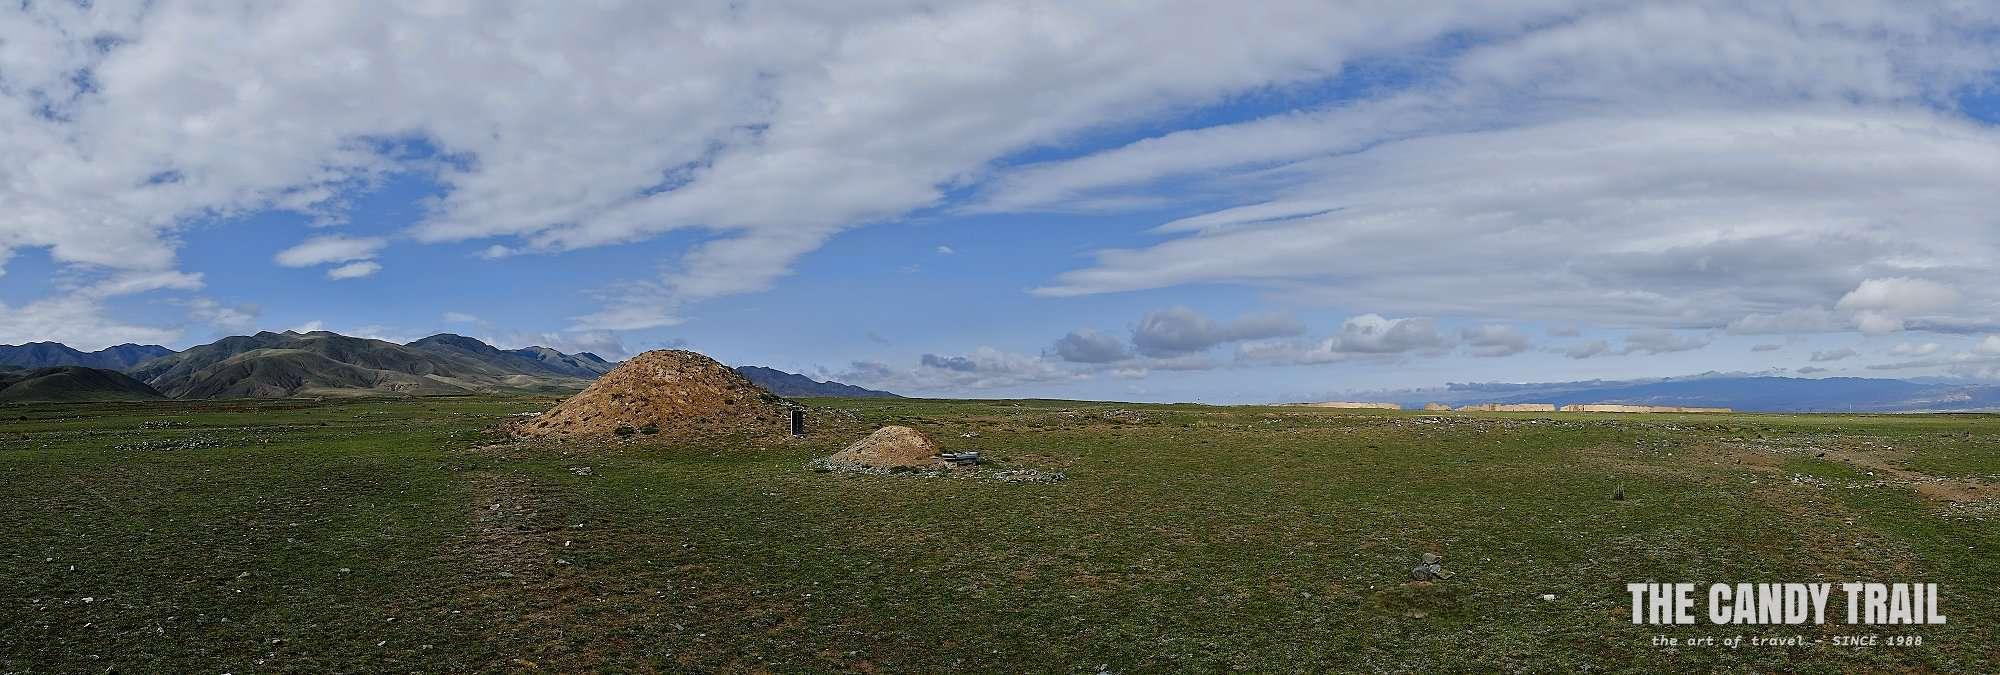 burial mound yongtai fortress panorama china